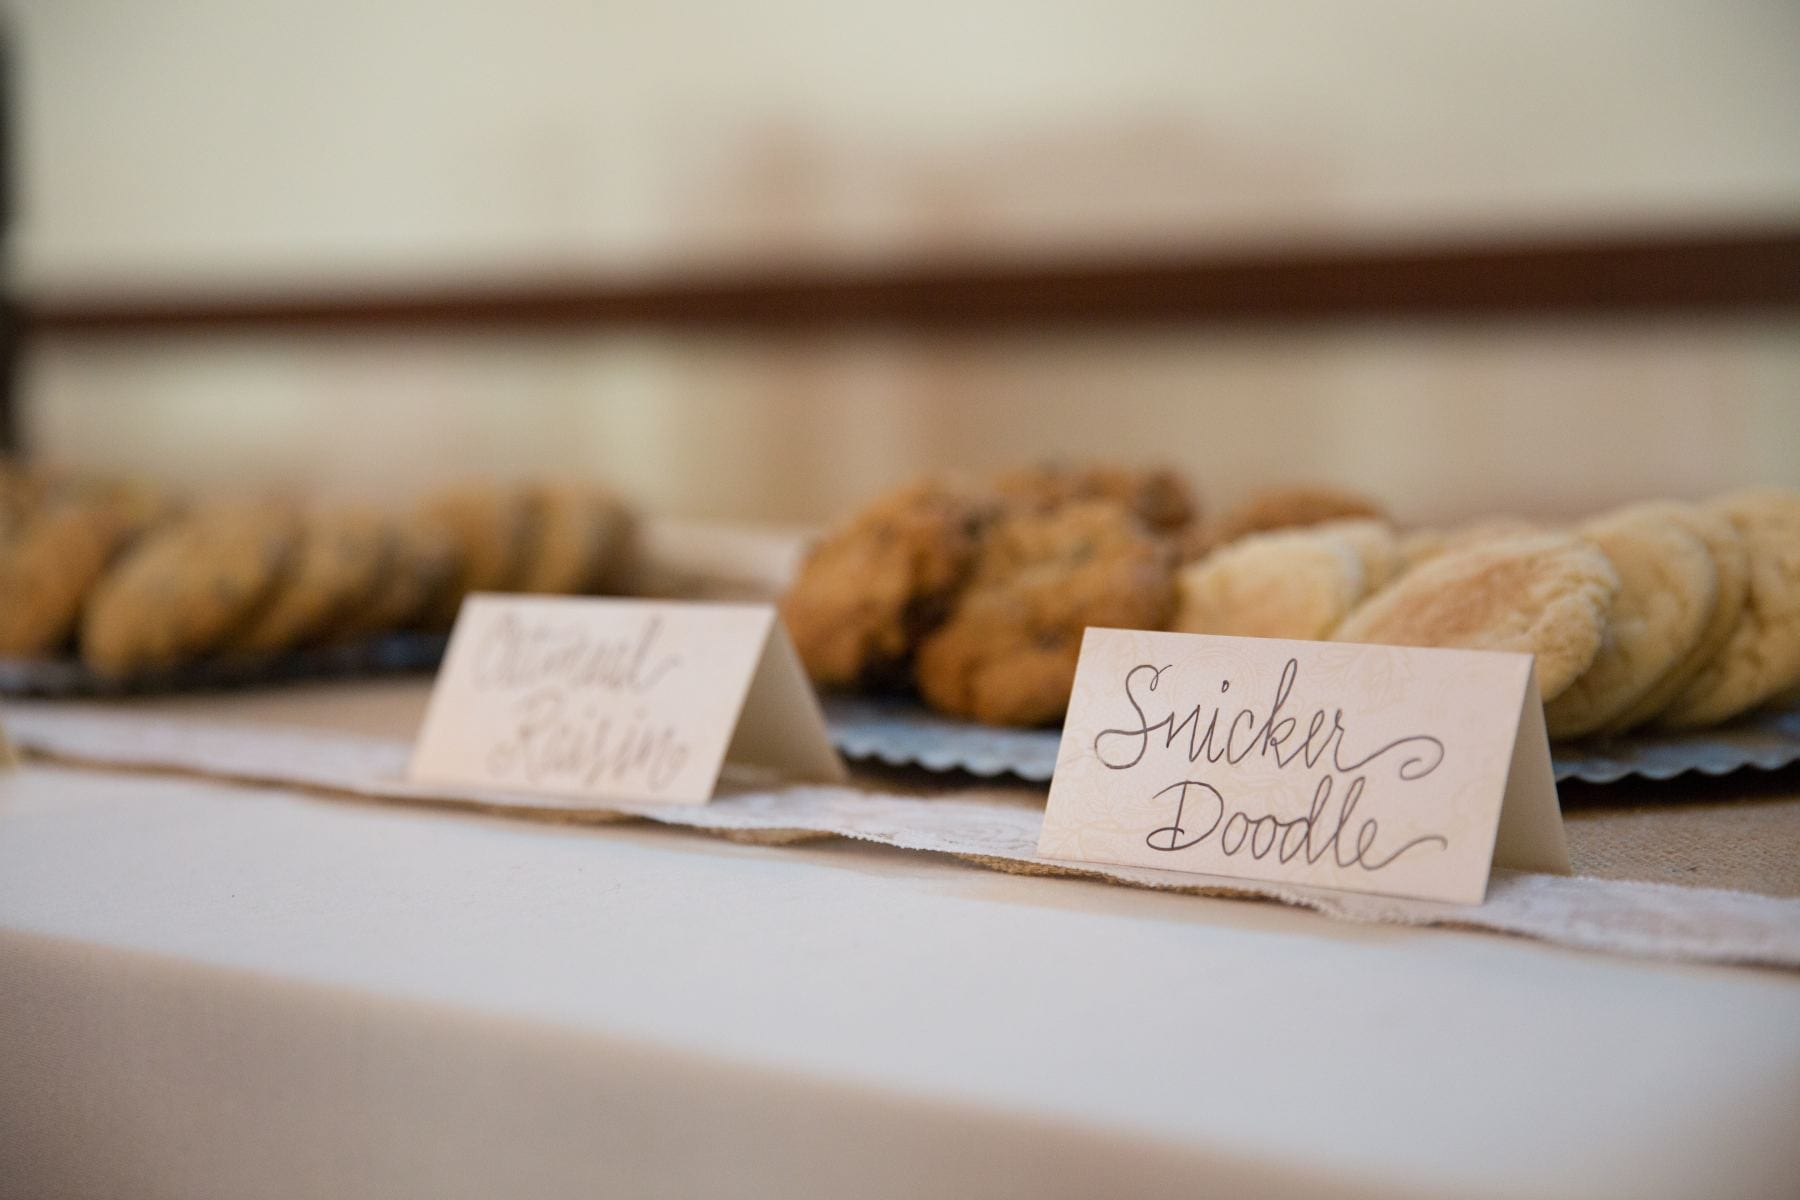 northwest indiana wedding venue, catering venue in northwest indiana